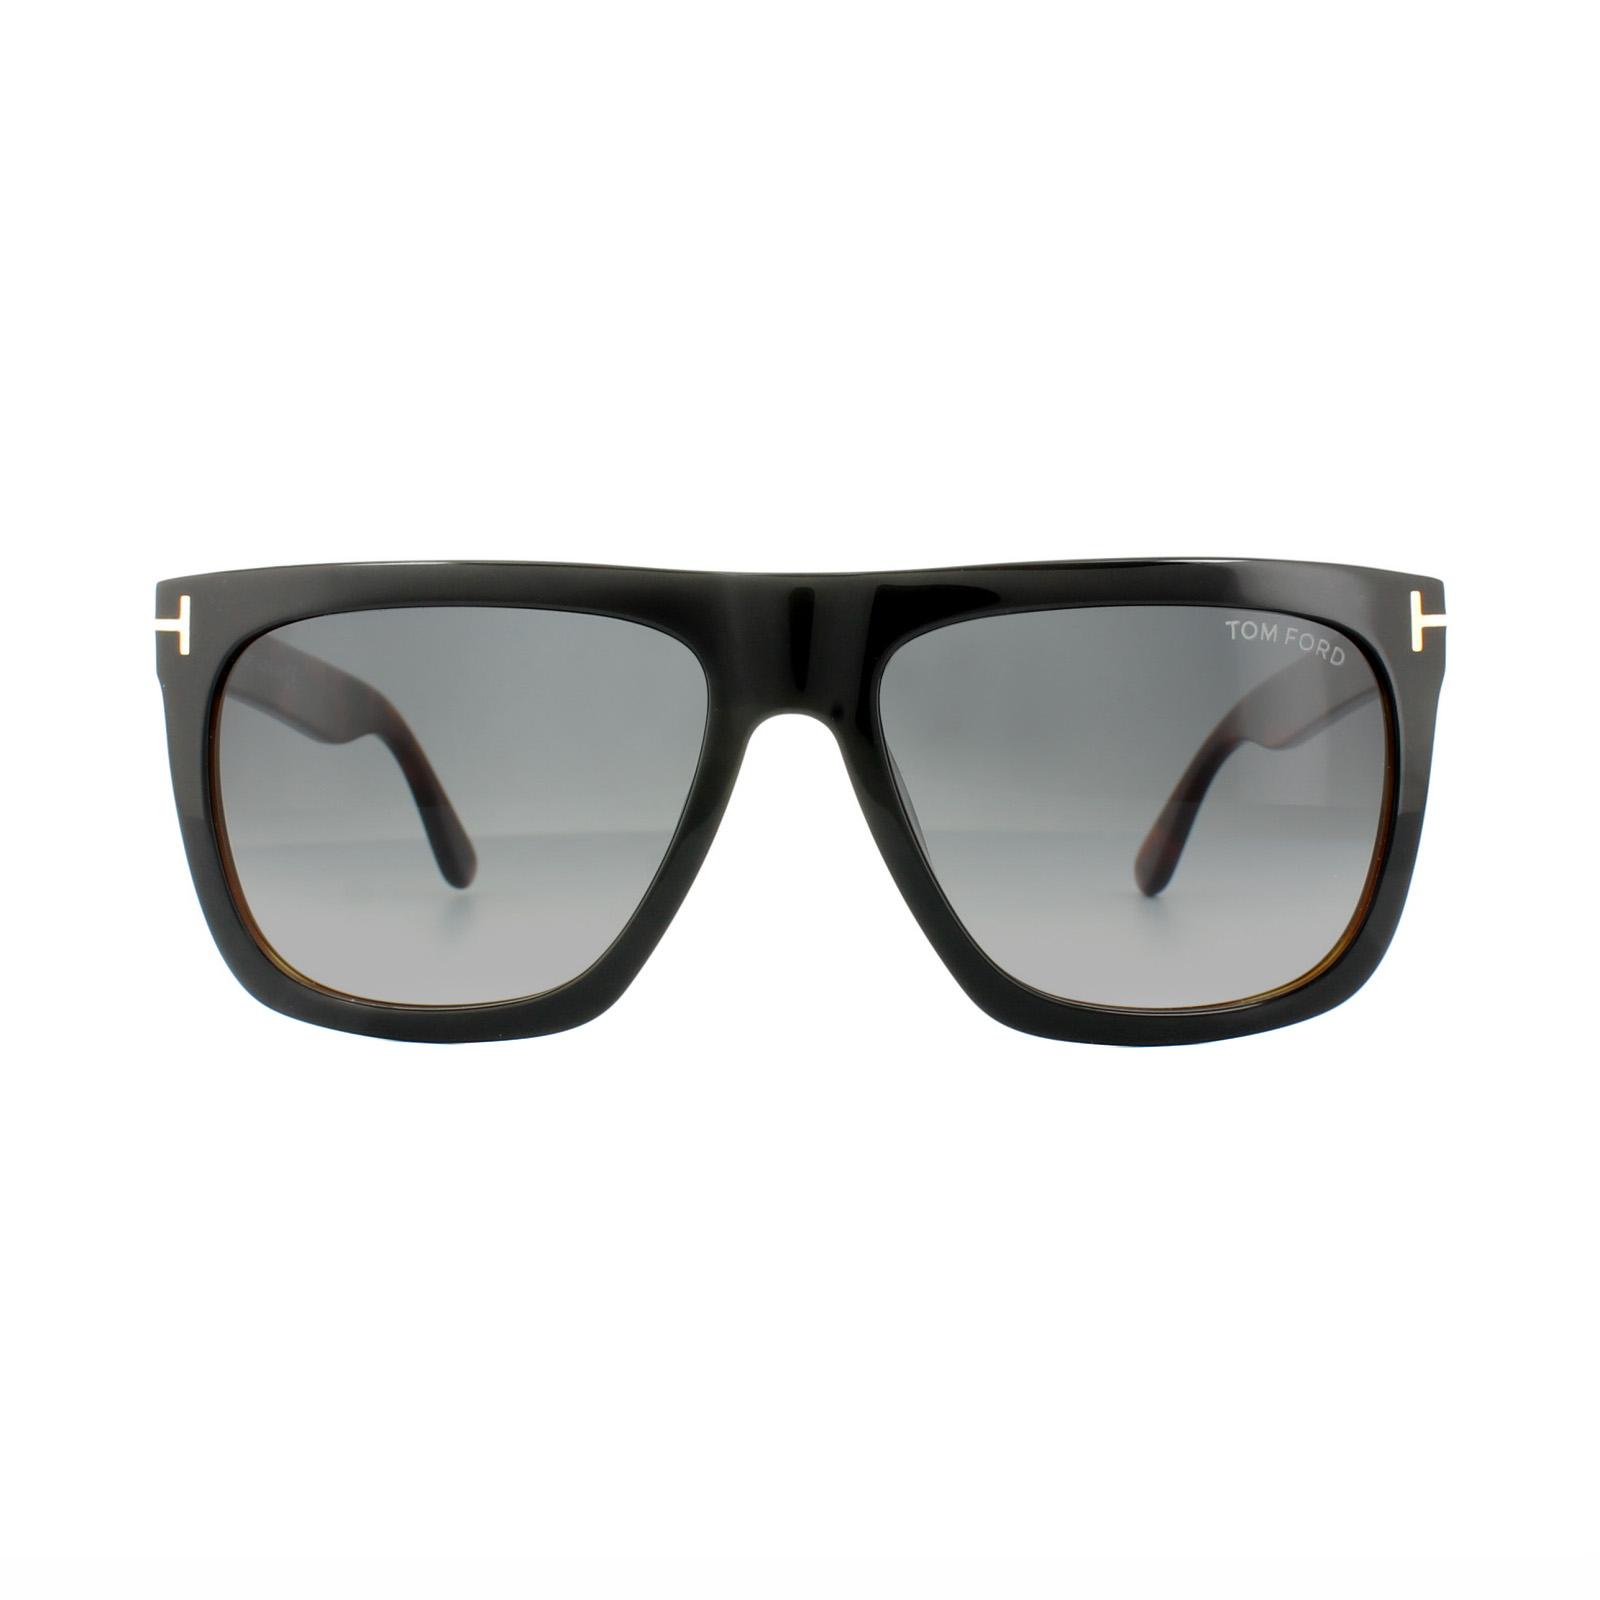 Tom Ford Sonnenbrille »Morgan FT0513«, schwarz, 05B - schwarz/grau